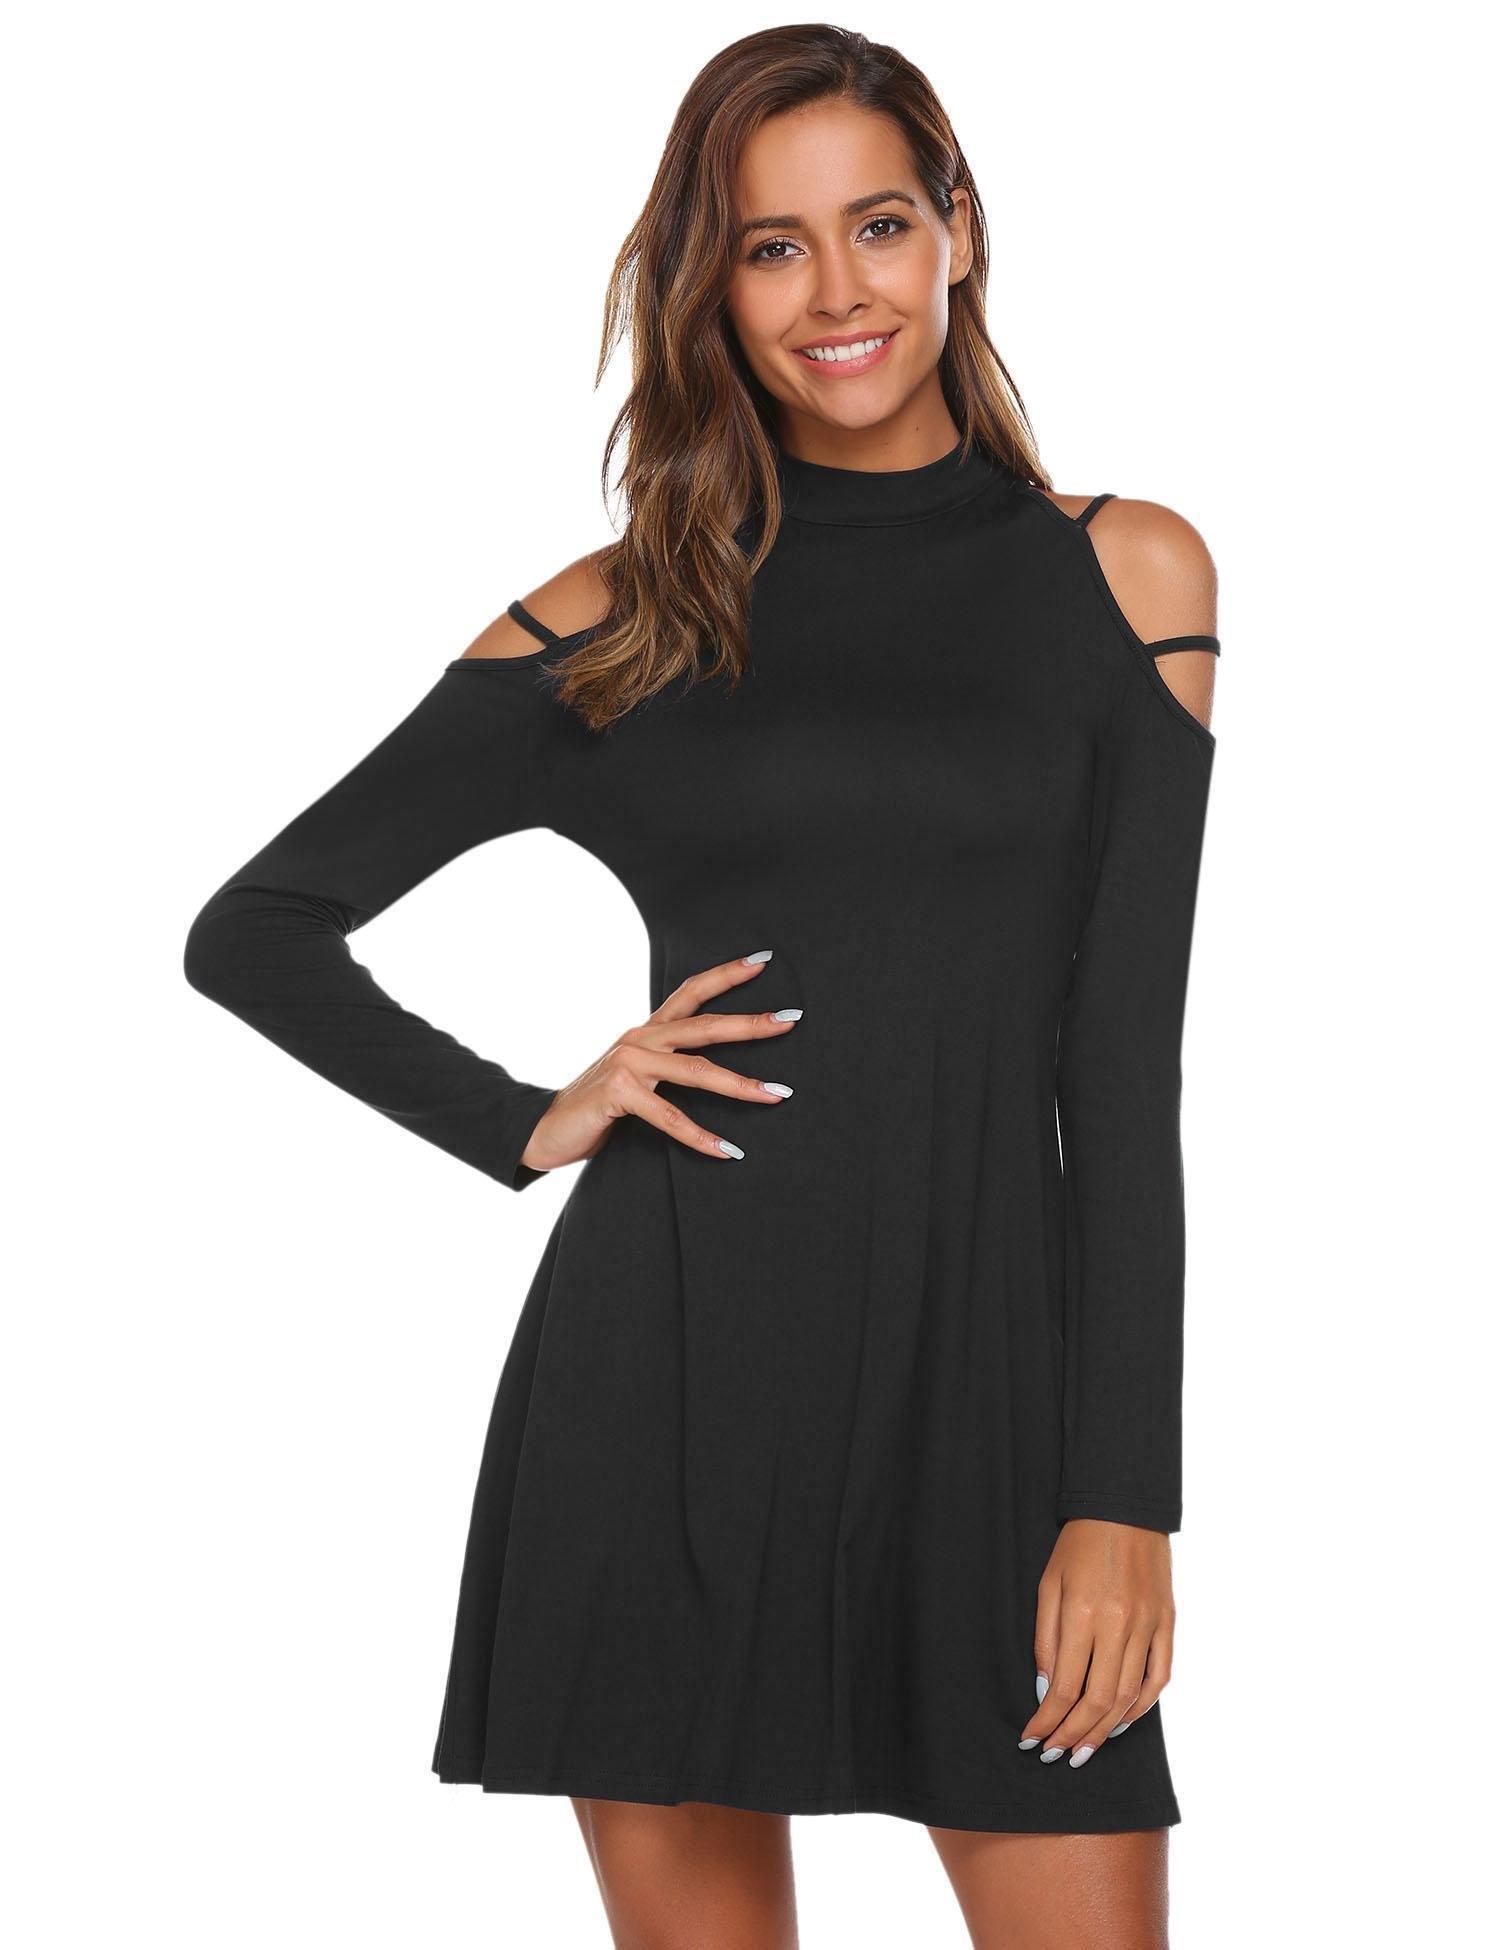 Misakia Women's Cold Shoulder Tunic Top T-shirt Swing Dress (Black S)